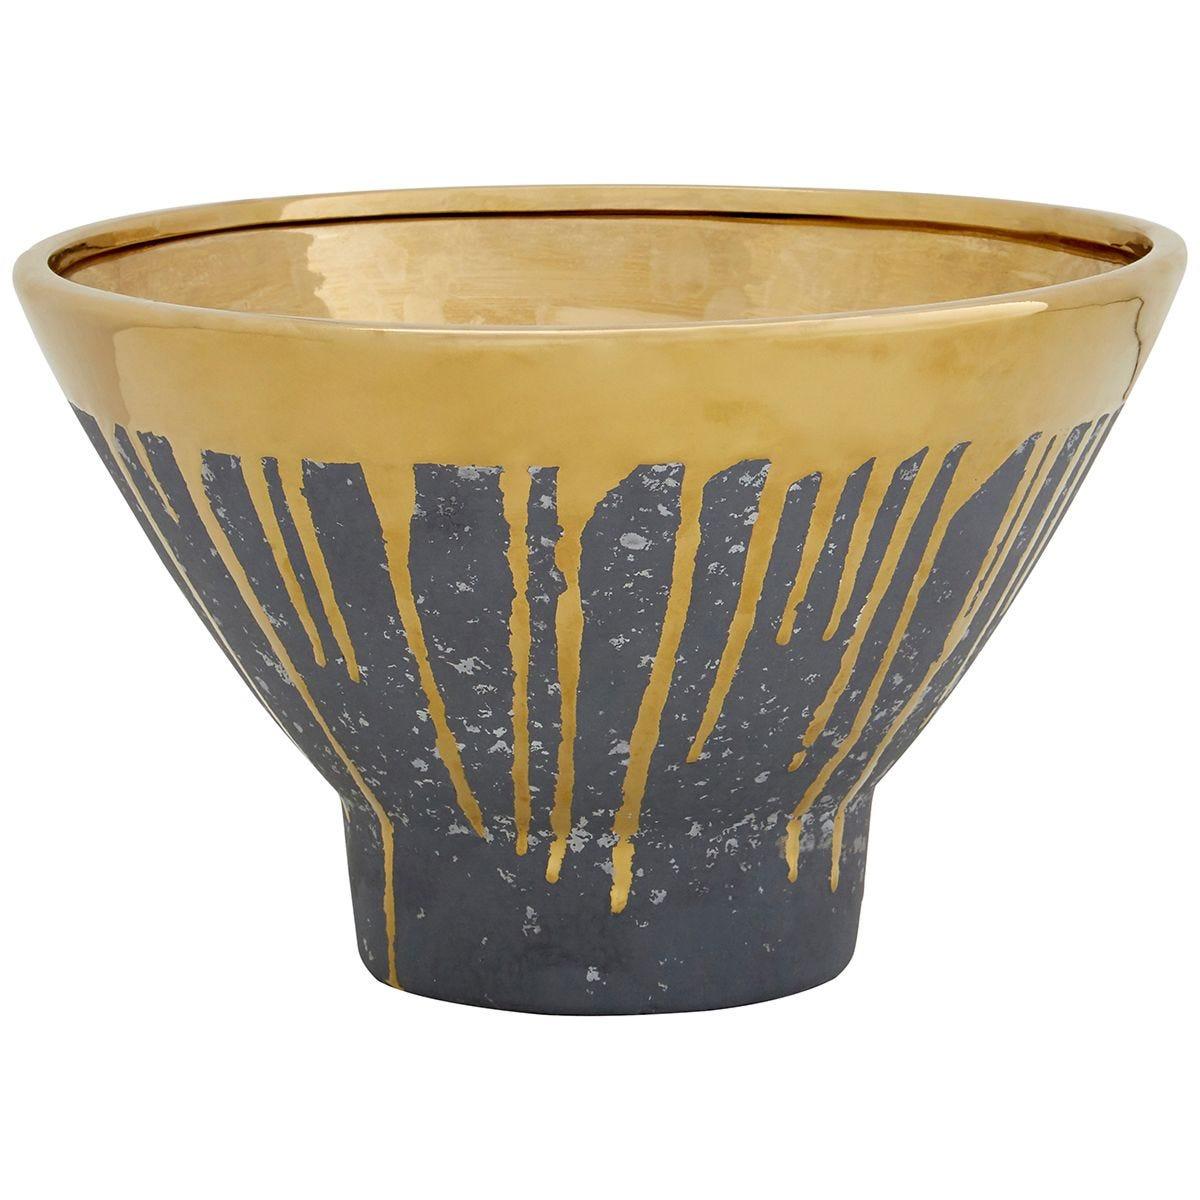 Premier Housewares Cyrus Bowl - Grey/Gold Finish